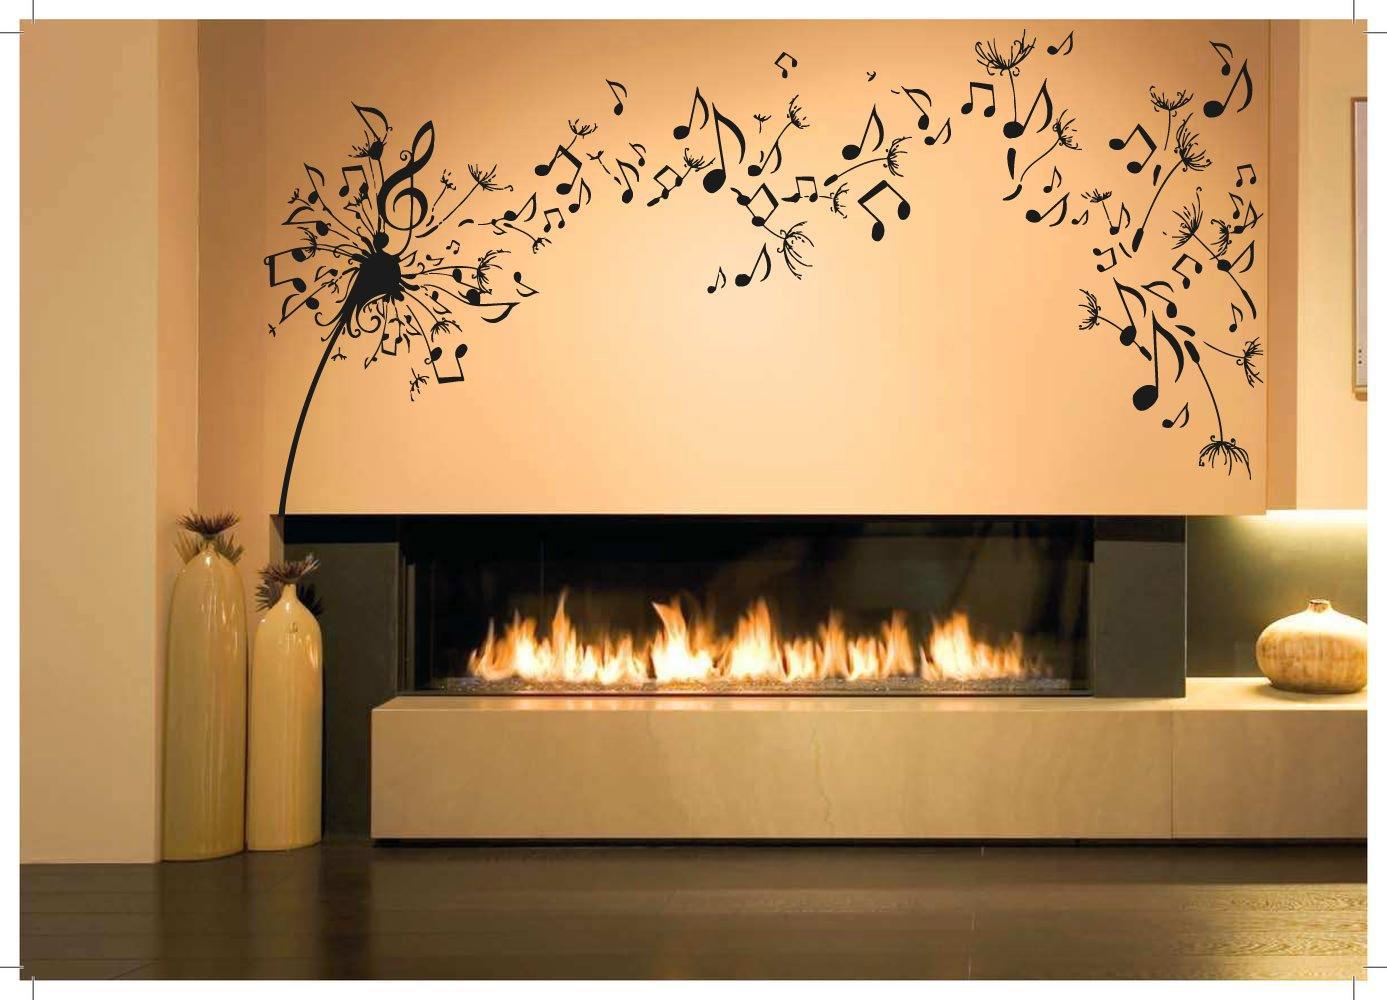 Amazon.com: Wall Room Decor Art Vinyl Sticker Mural Decal Dandelion ...